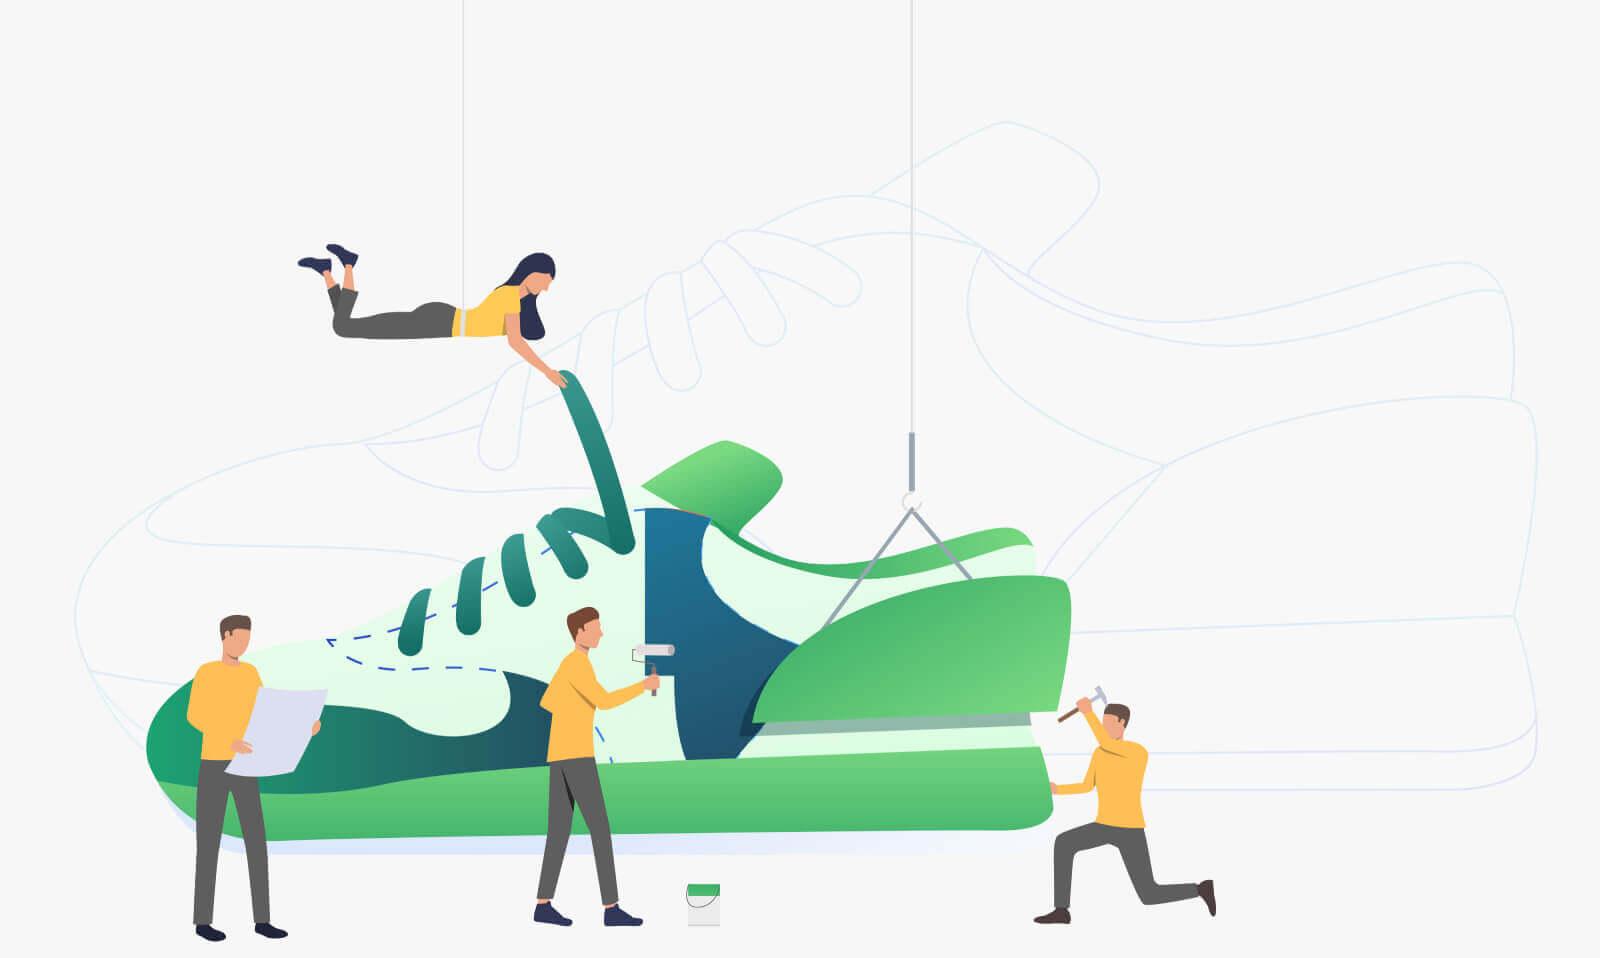 designing sneakers image